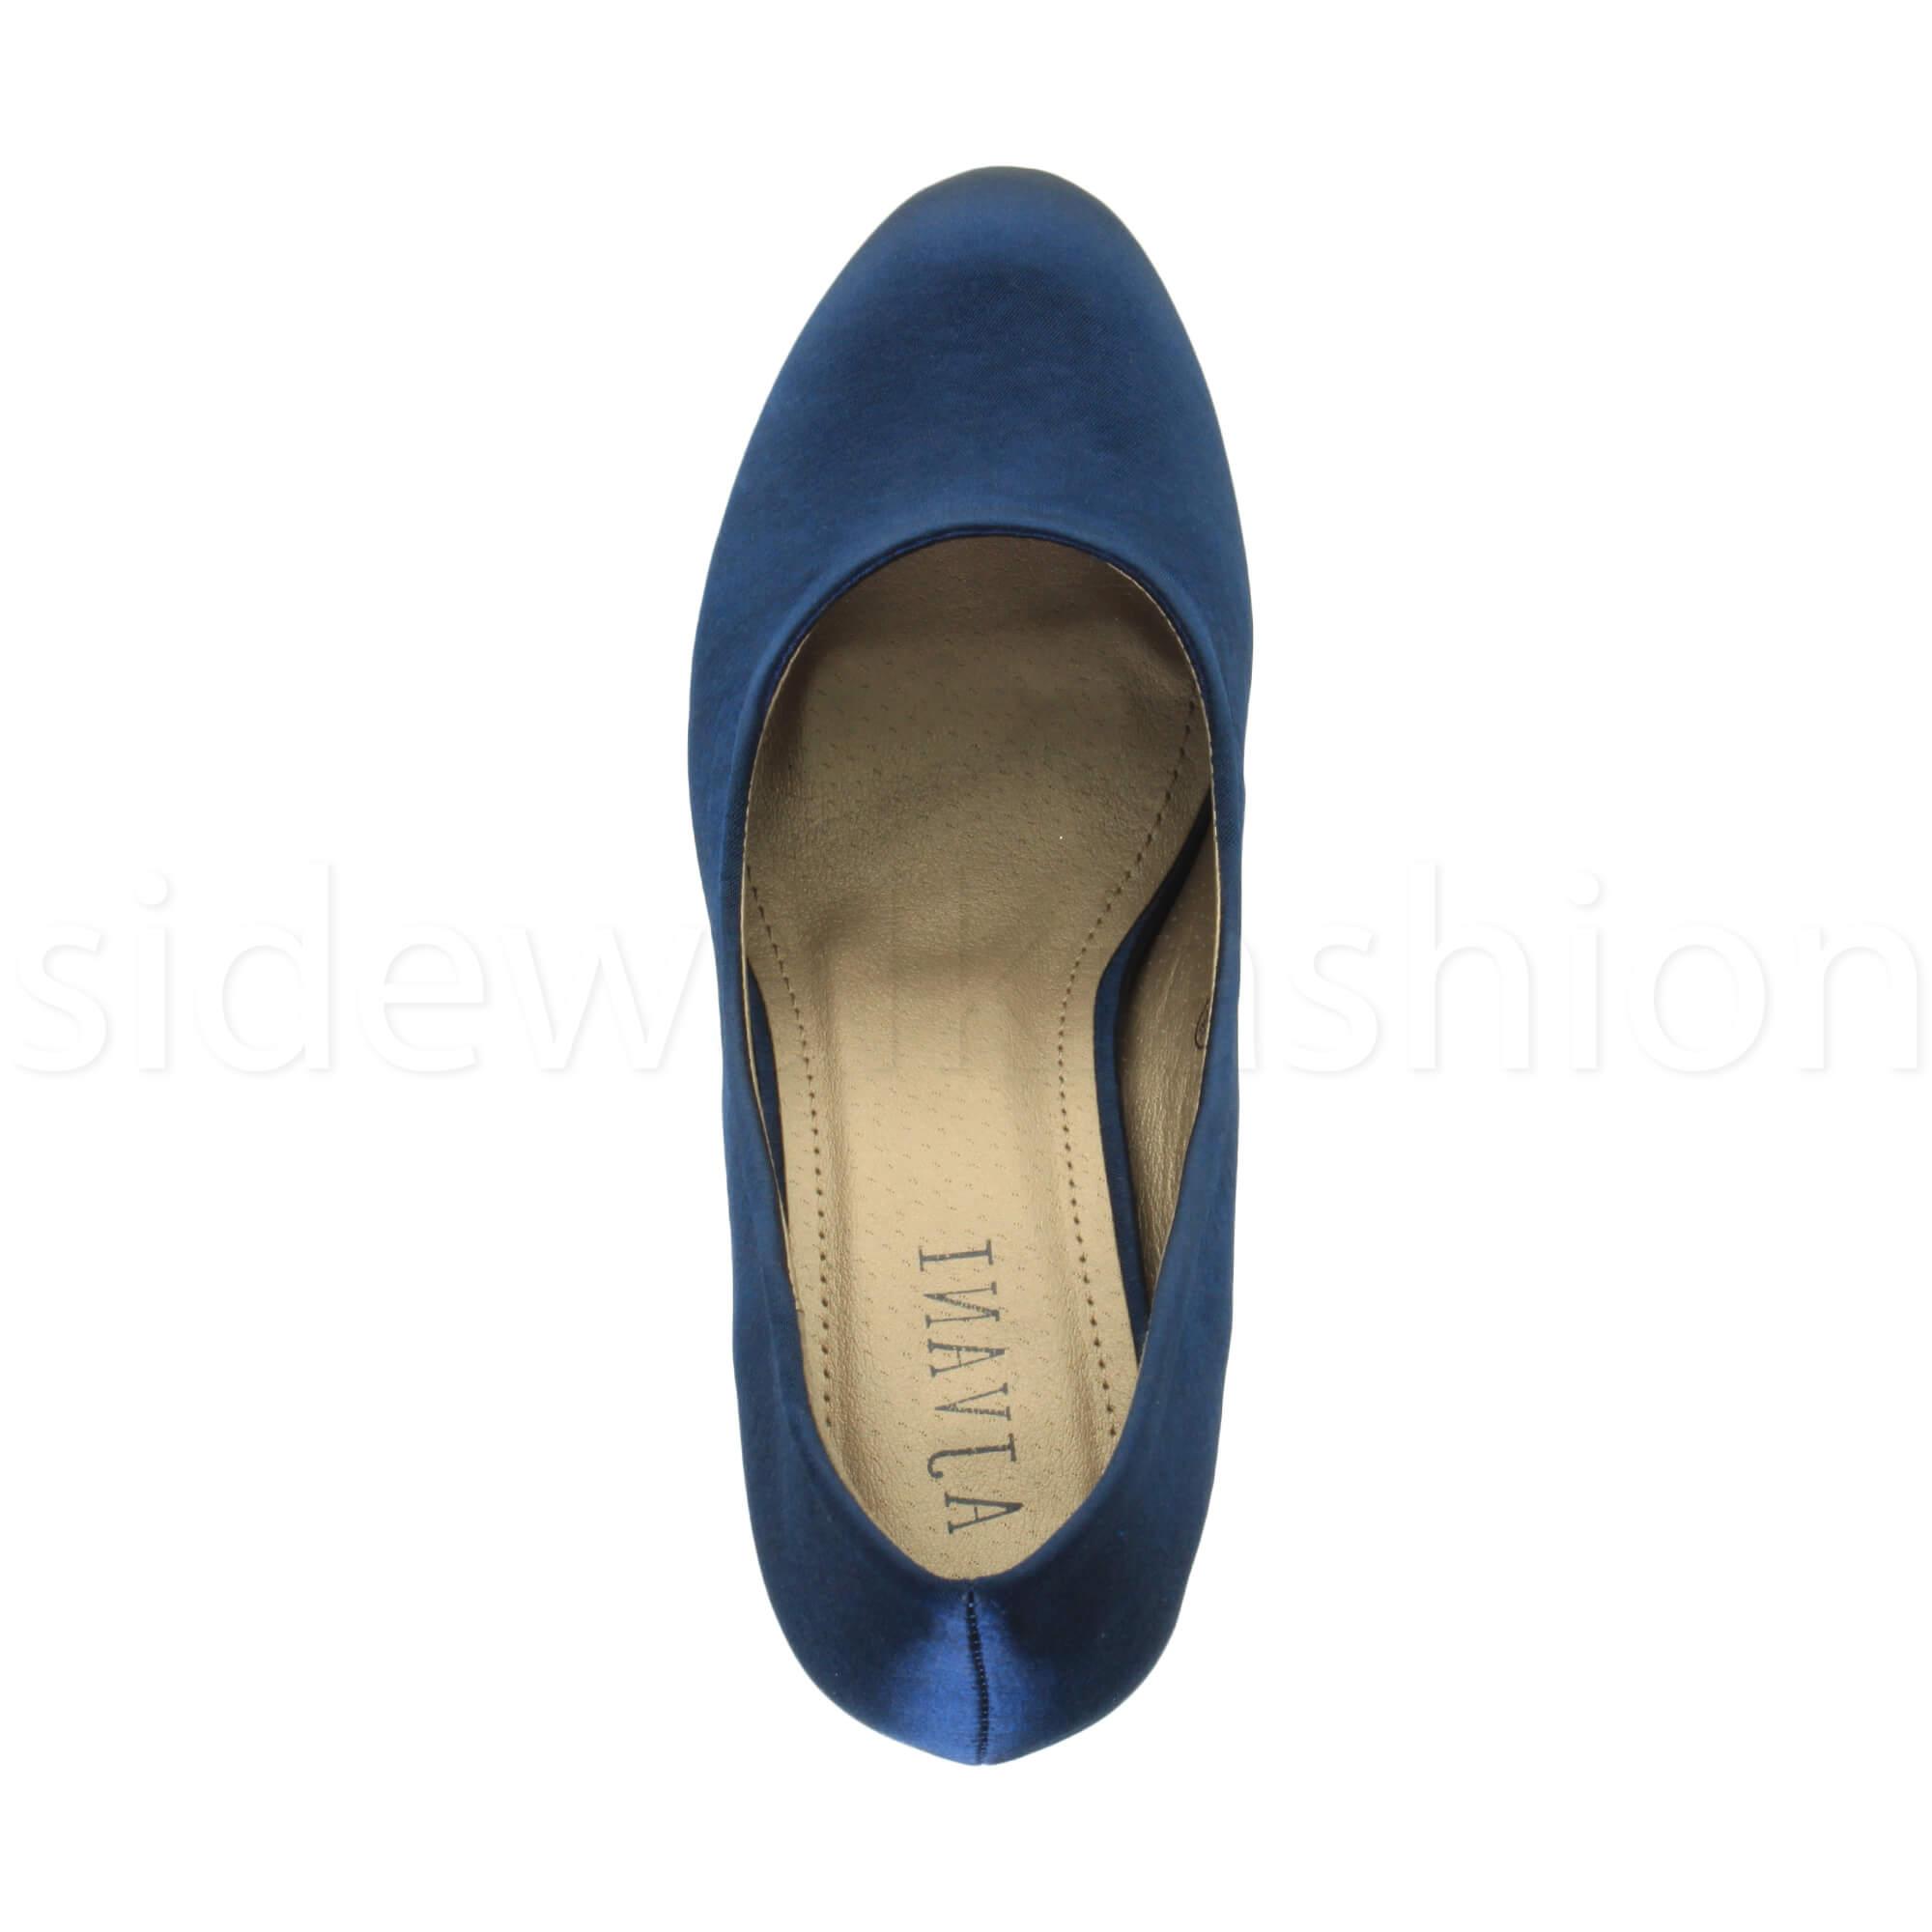 Womens-ladies-high-mid-heel-platform-wedding-evening-bridesmaid-court-shoes-size thumbnail 119